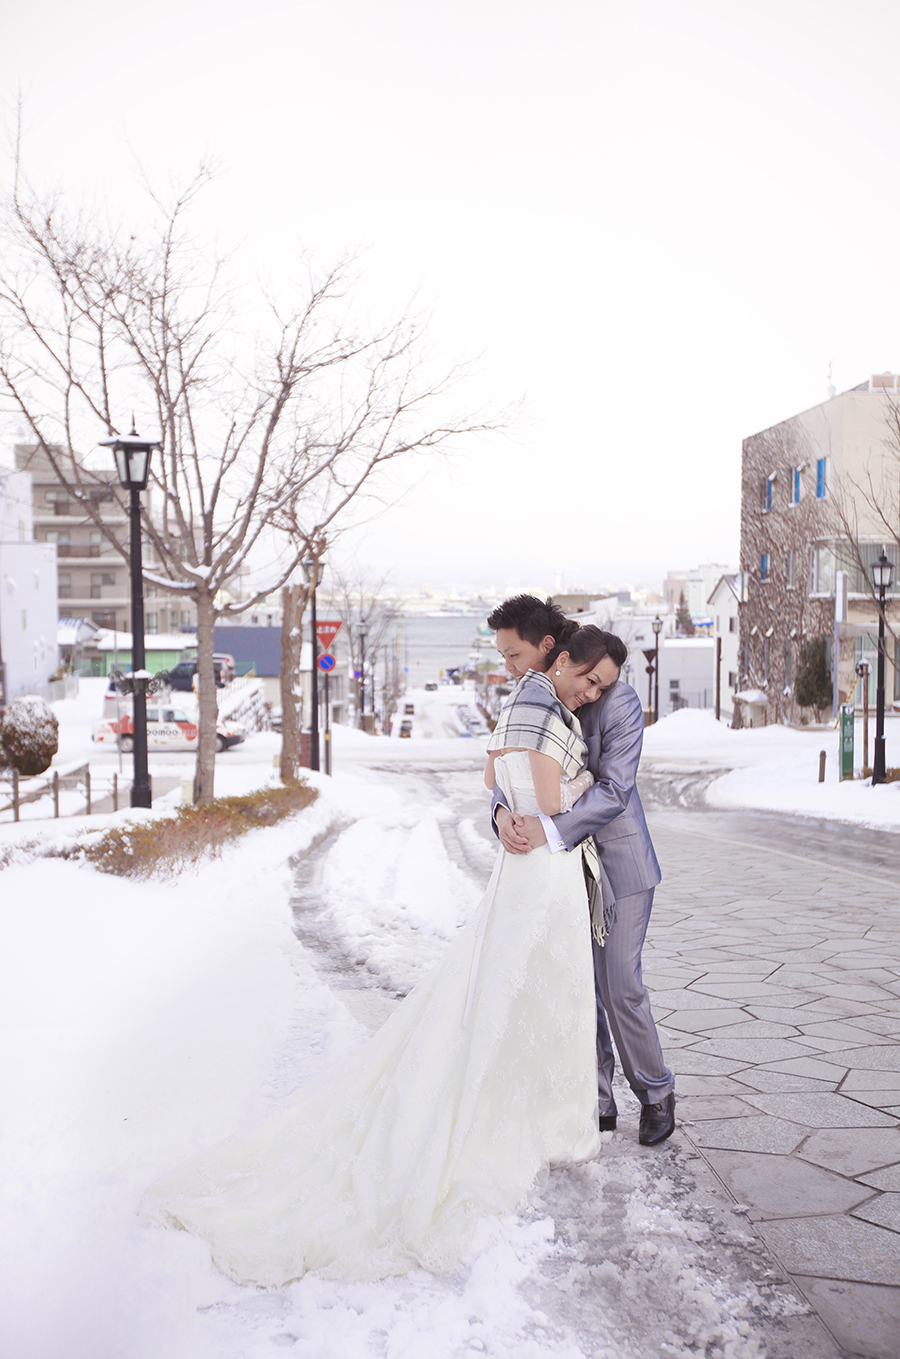 hokkaido tokyo japan . wedding photography by kurt ahs . 5068.jpg